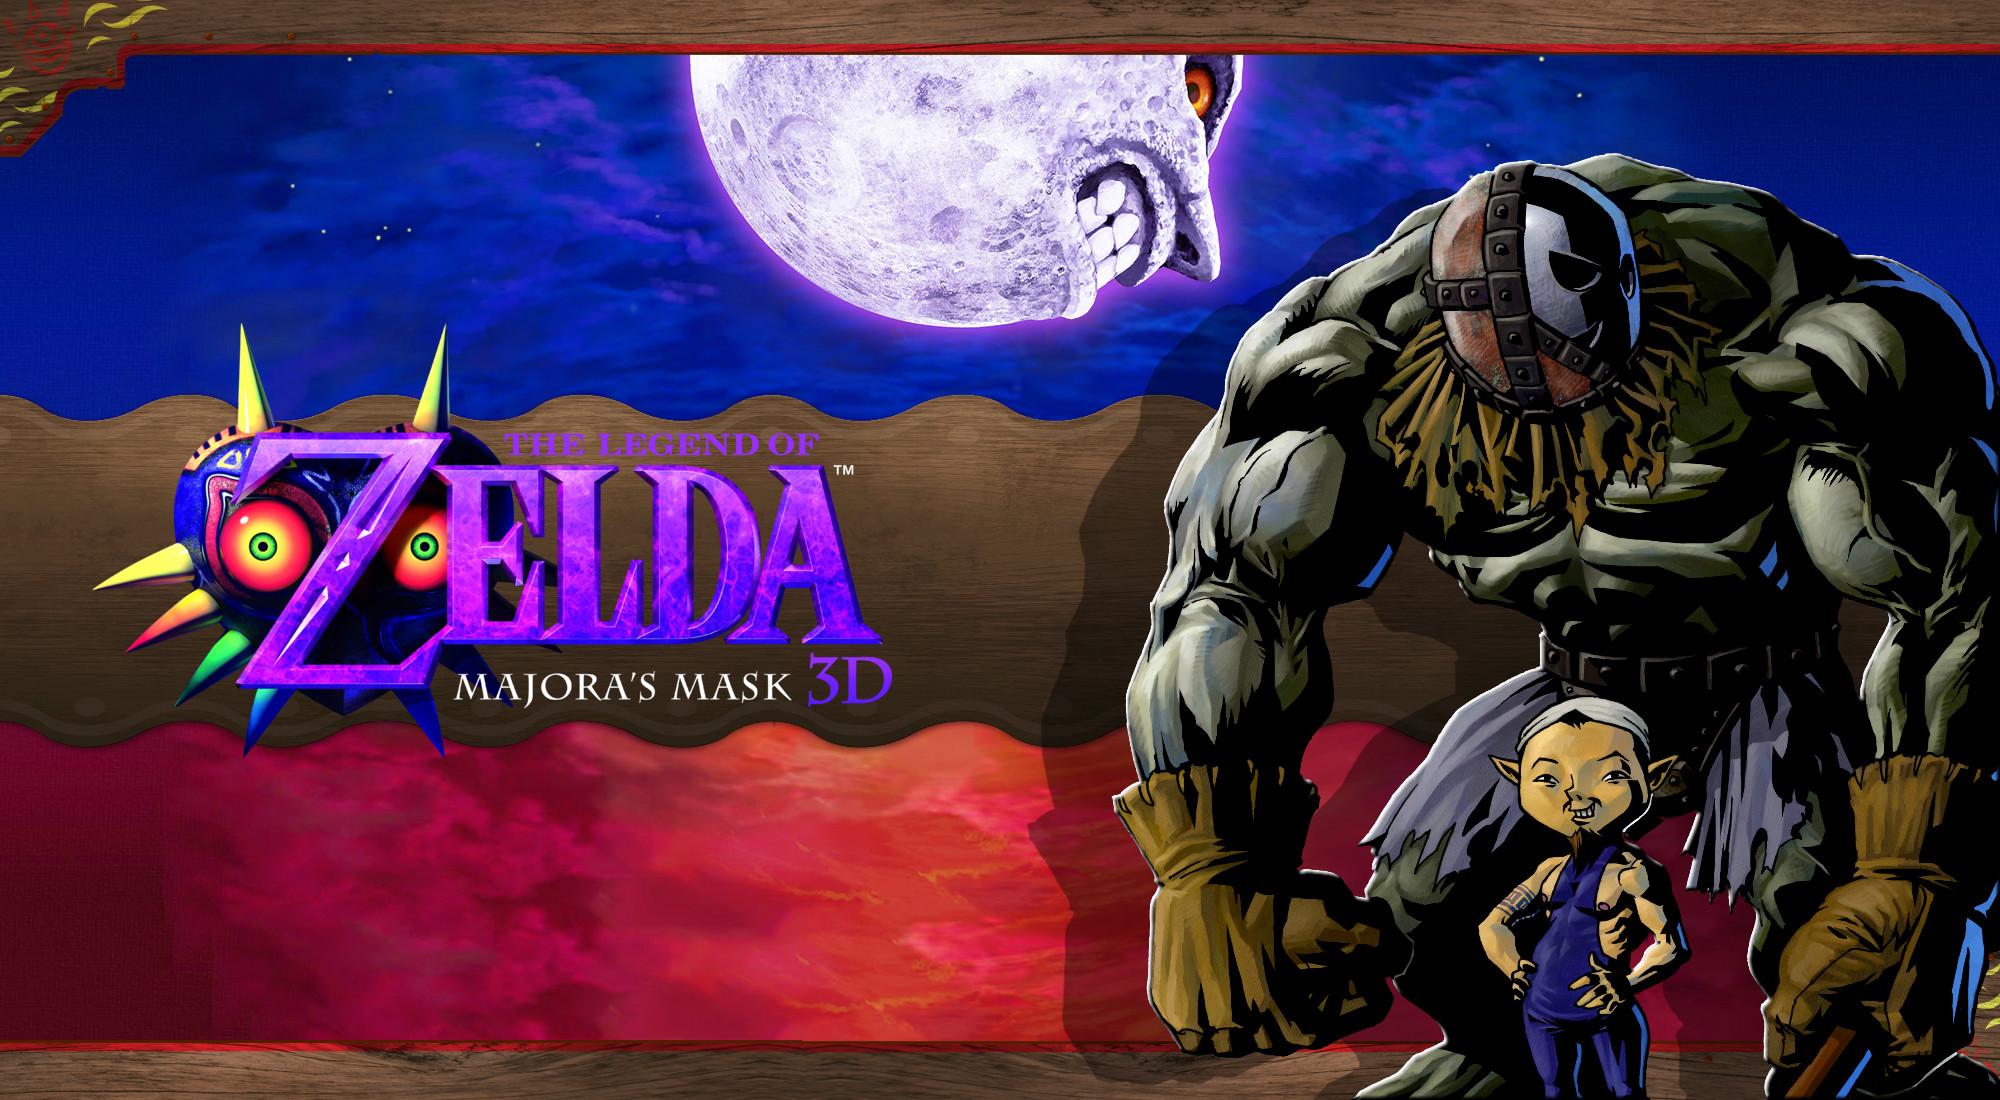 … Majora's Mask 3D Wallpaper – Zubora and Gabora by DaKidGaming